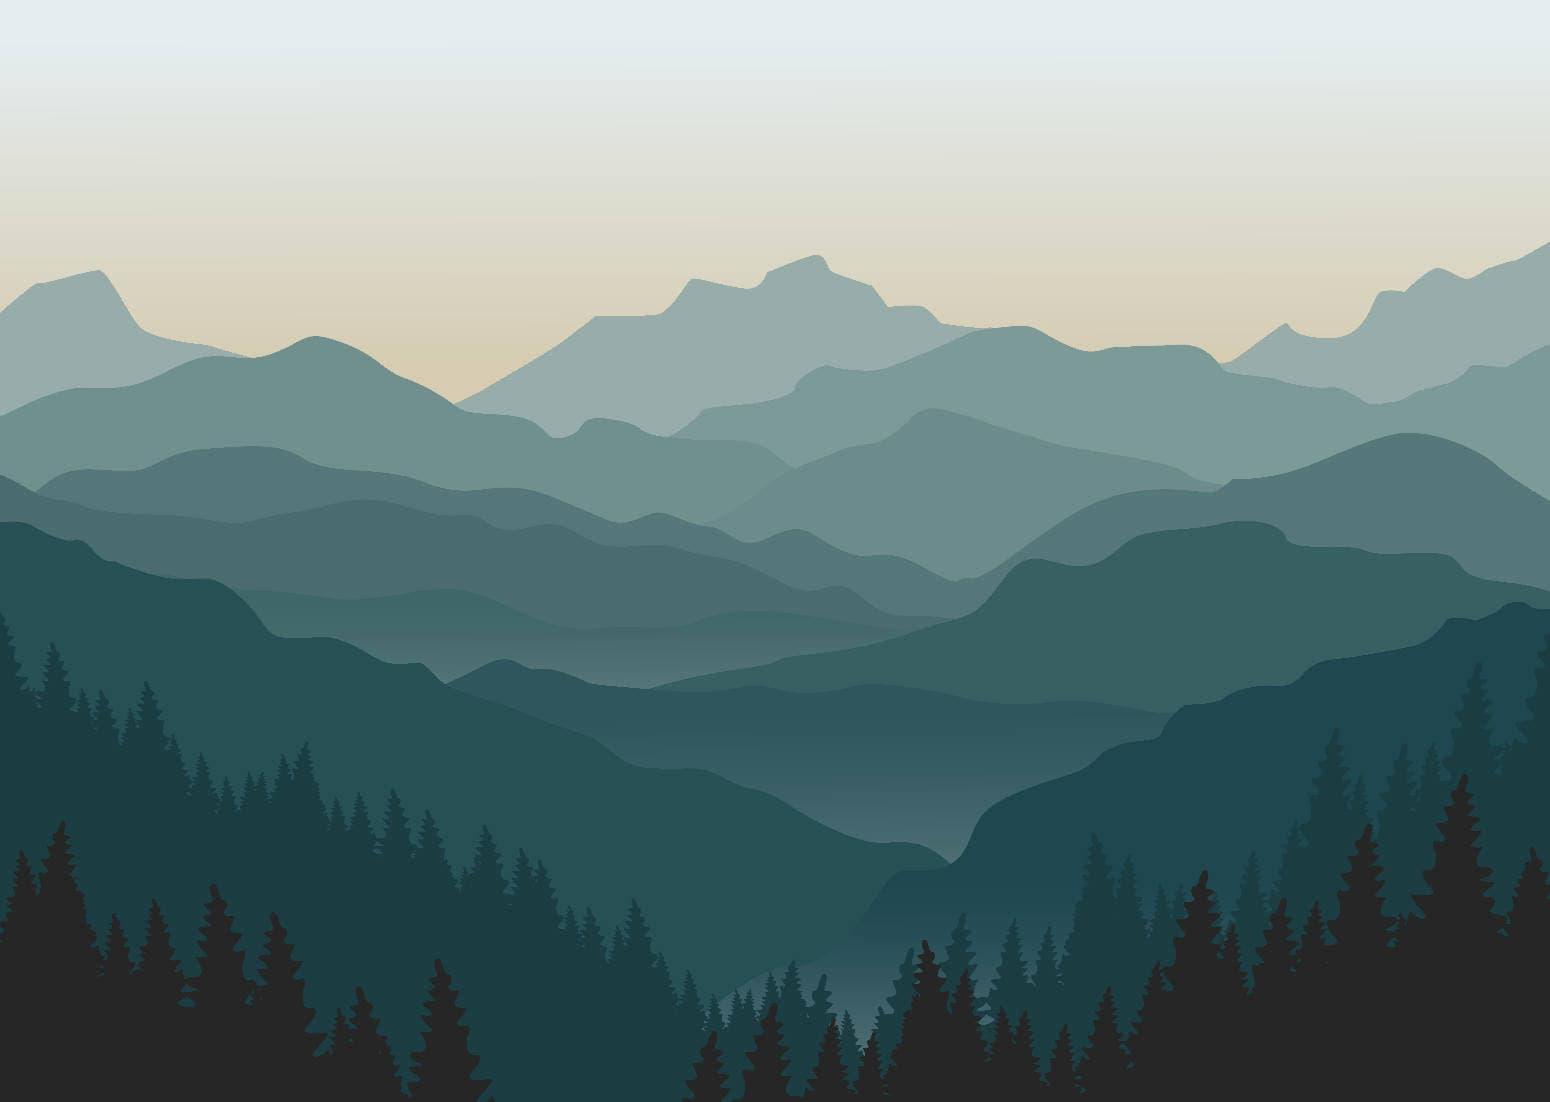 Popular Wallpaper Mountain Mural - il_fullxfull  Trends_877796.jpg?version\u003d0